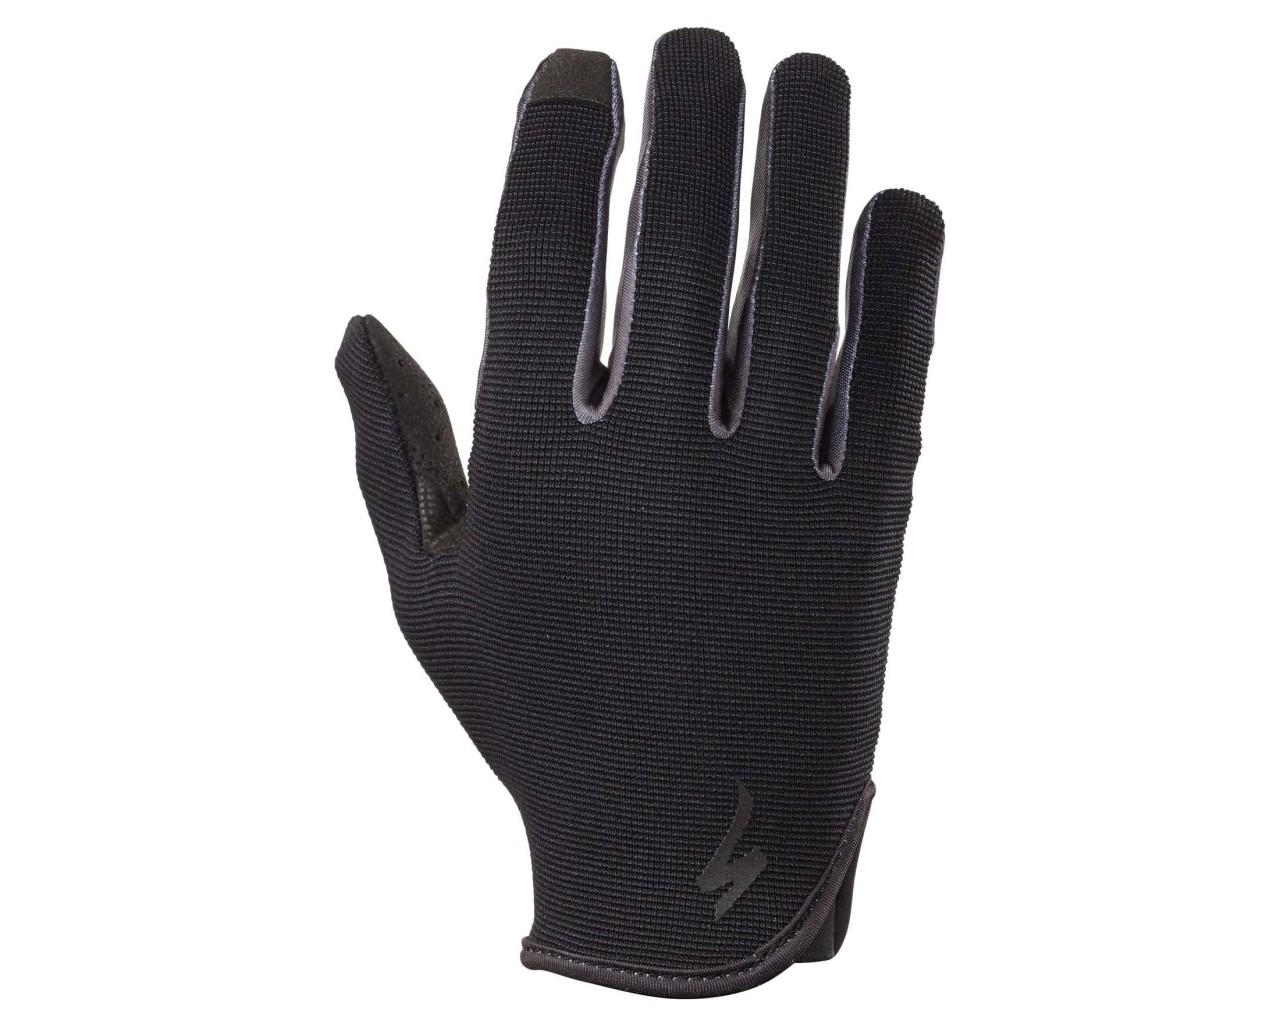 Specialized Lodown Damen Handschuhe langfinger | black mirror